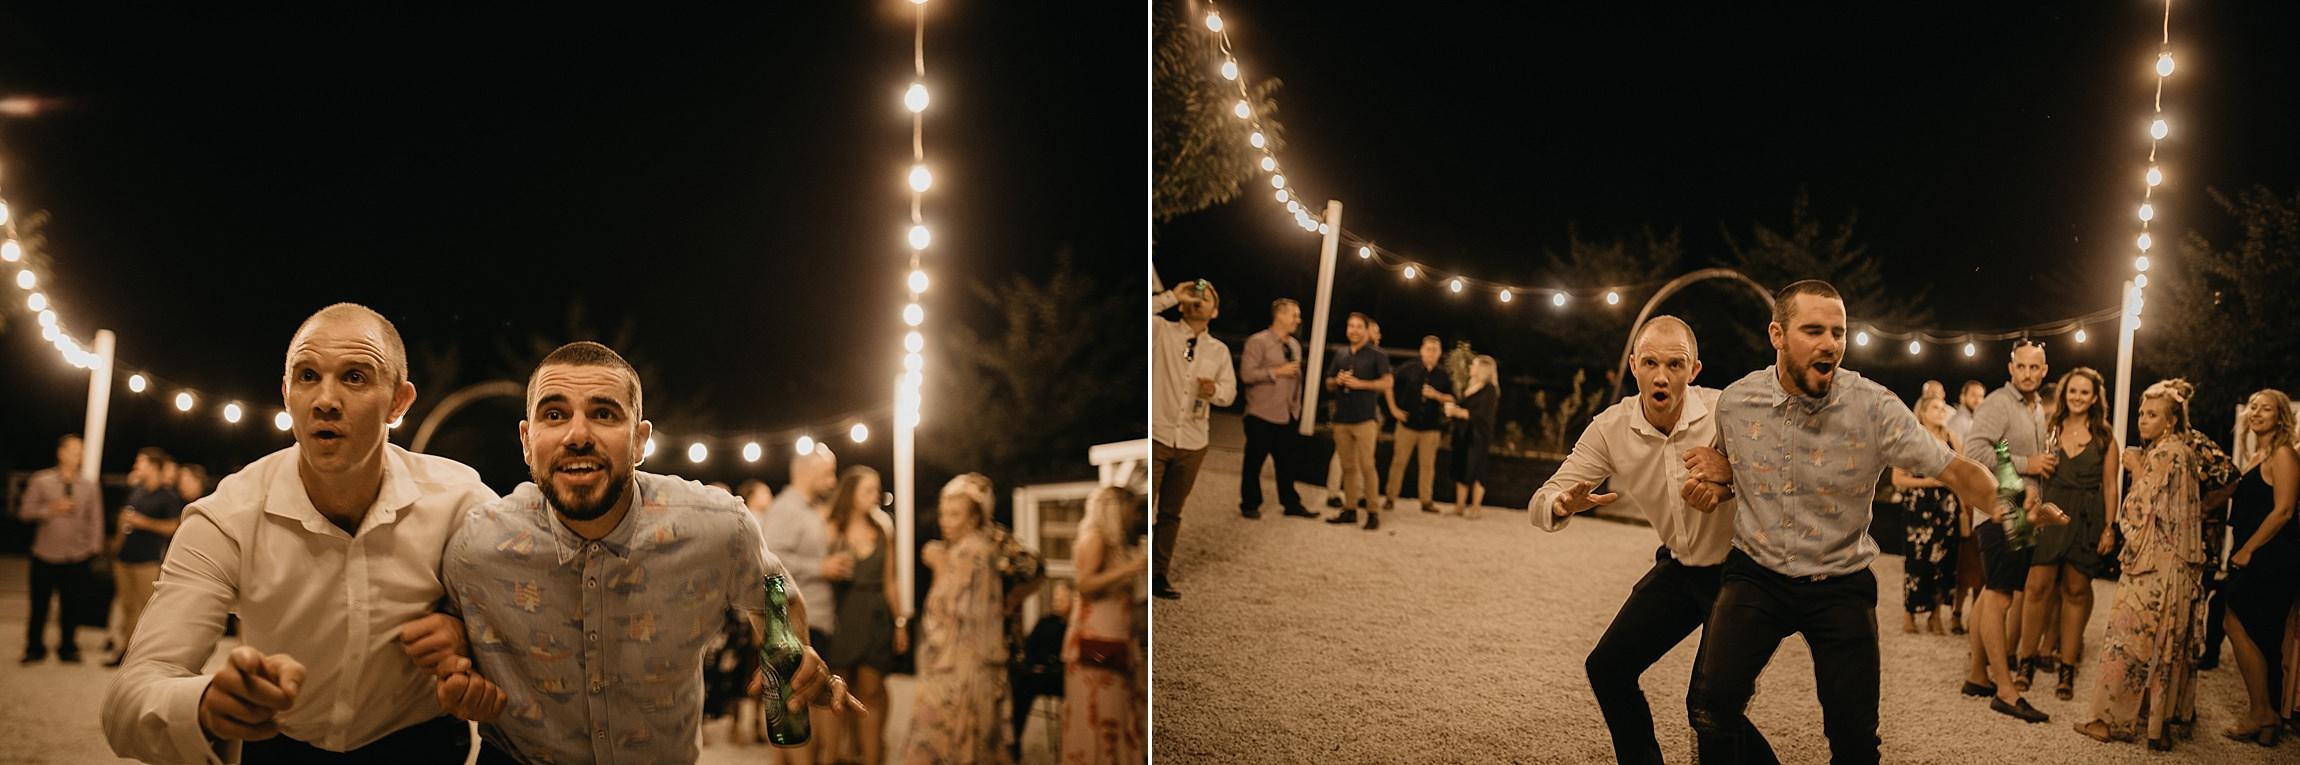 oldforestschool-wedding-blog-204.jpg